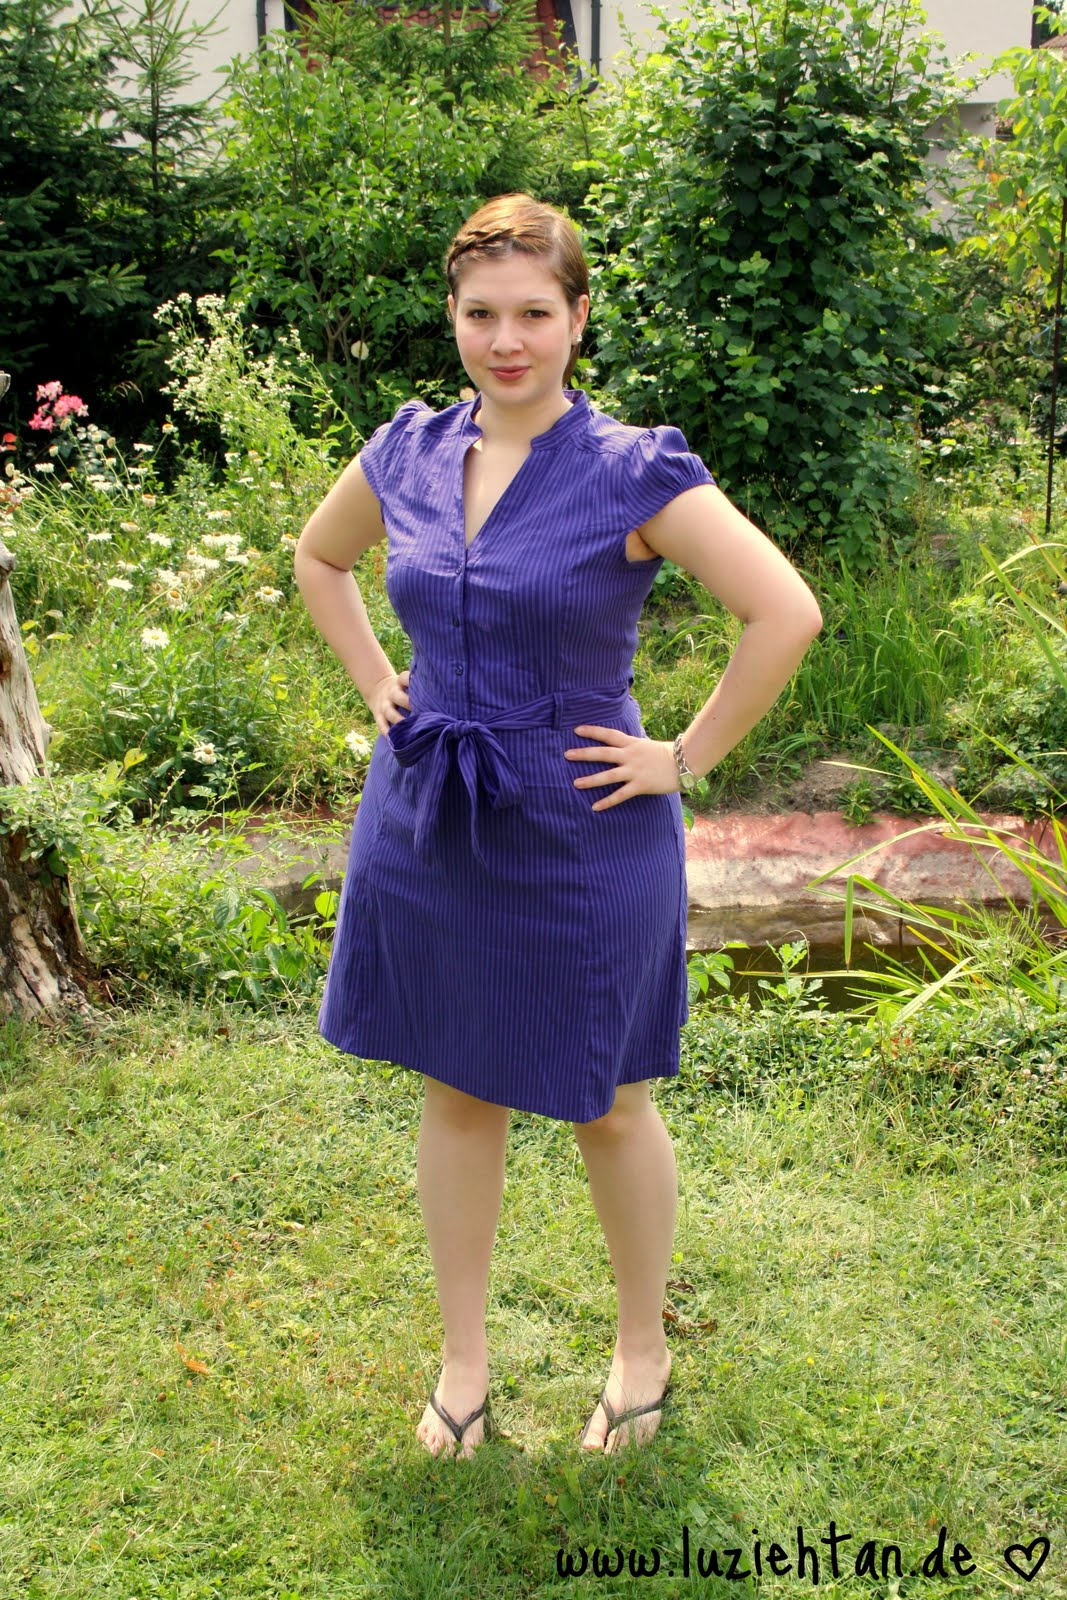 Putzfrau Outfit